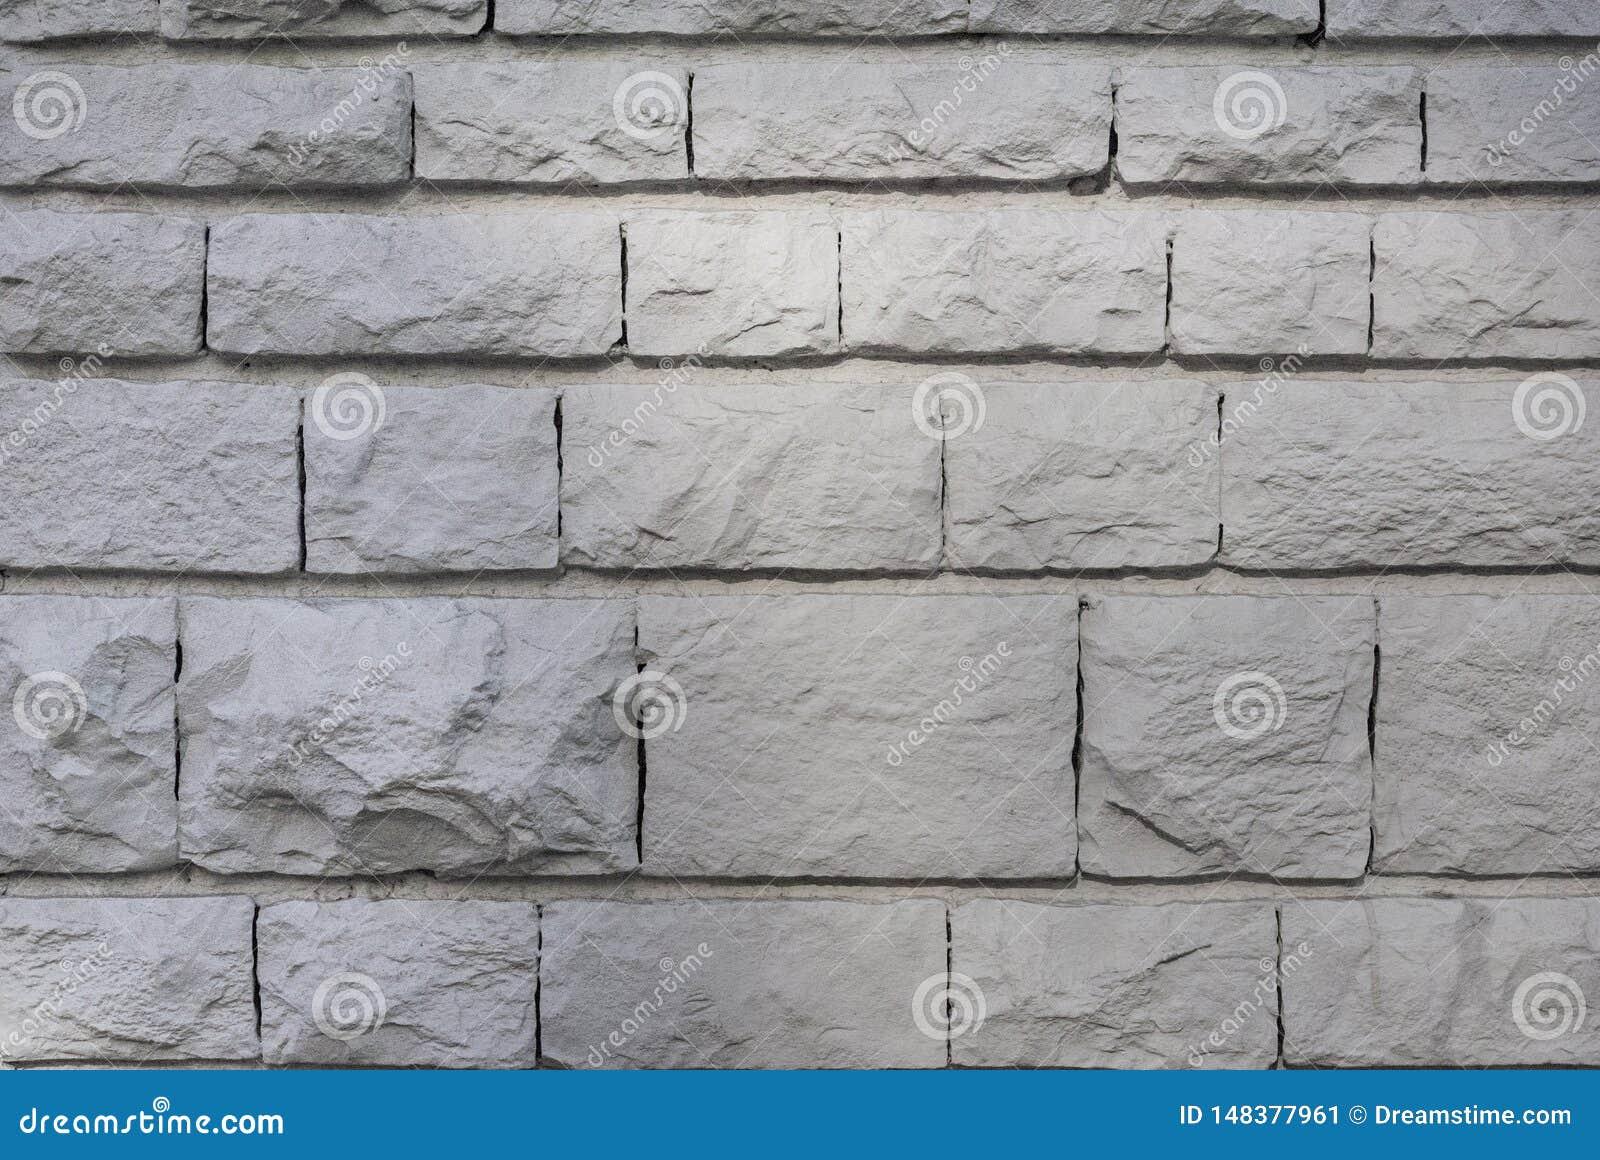 Старая срубленная каменная стена, красивая текстура предпосылки